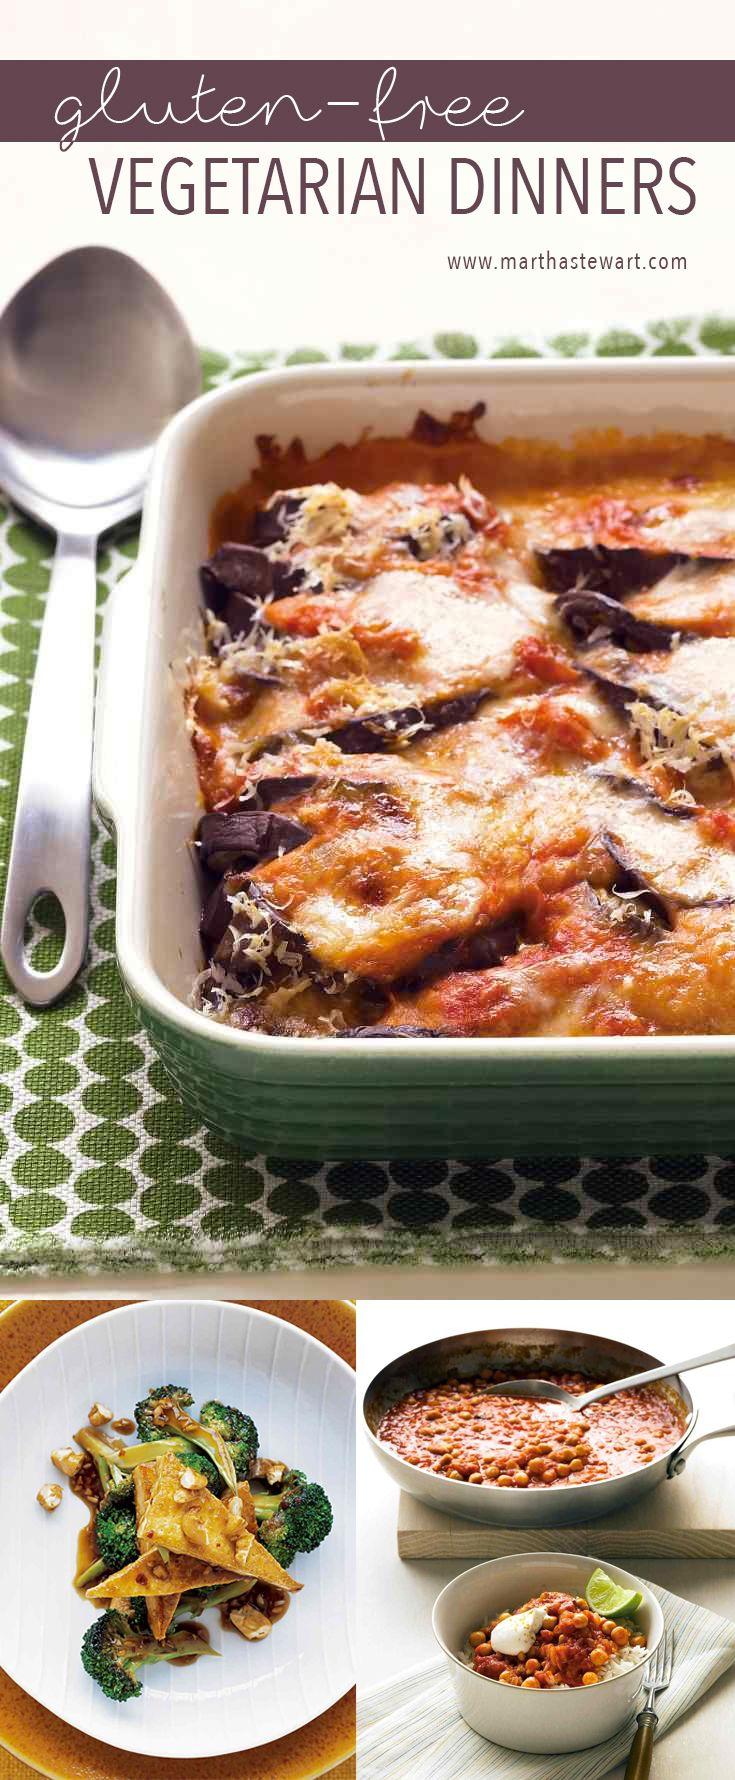 Gluten-Free Vegetarian Dinners | Martha Stewart Living